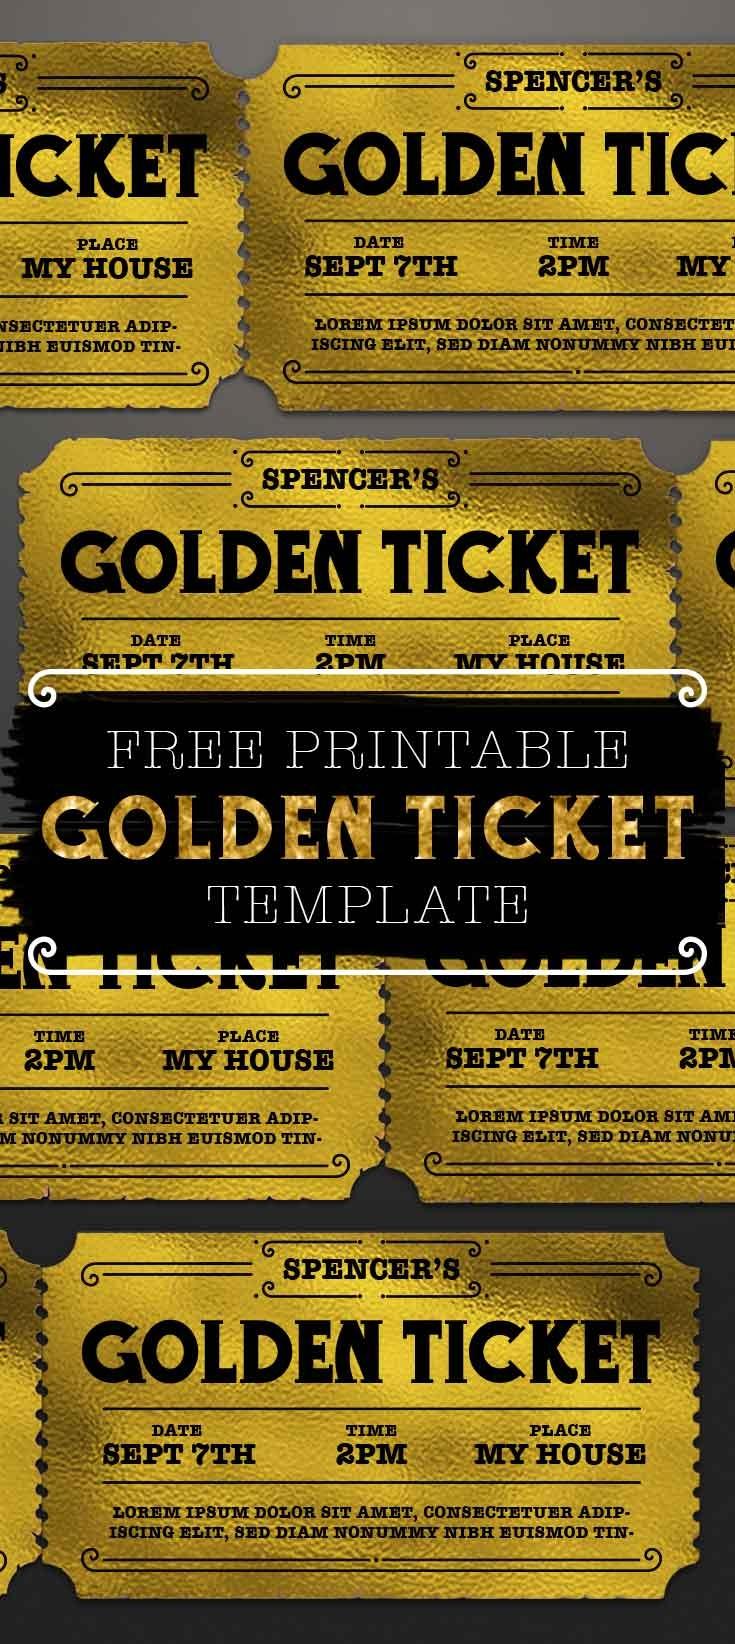 Customizable Golden Ticket Template - Free Printables Online - Golden Ticket Printable Free